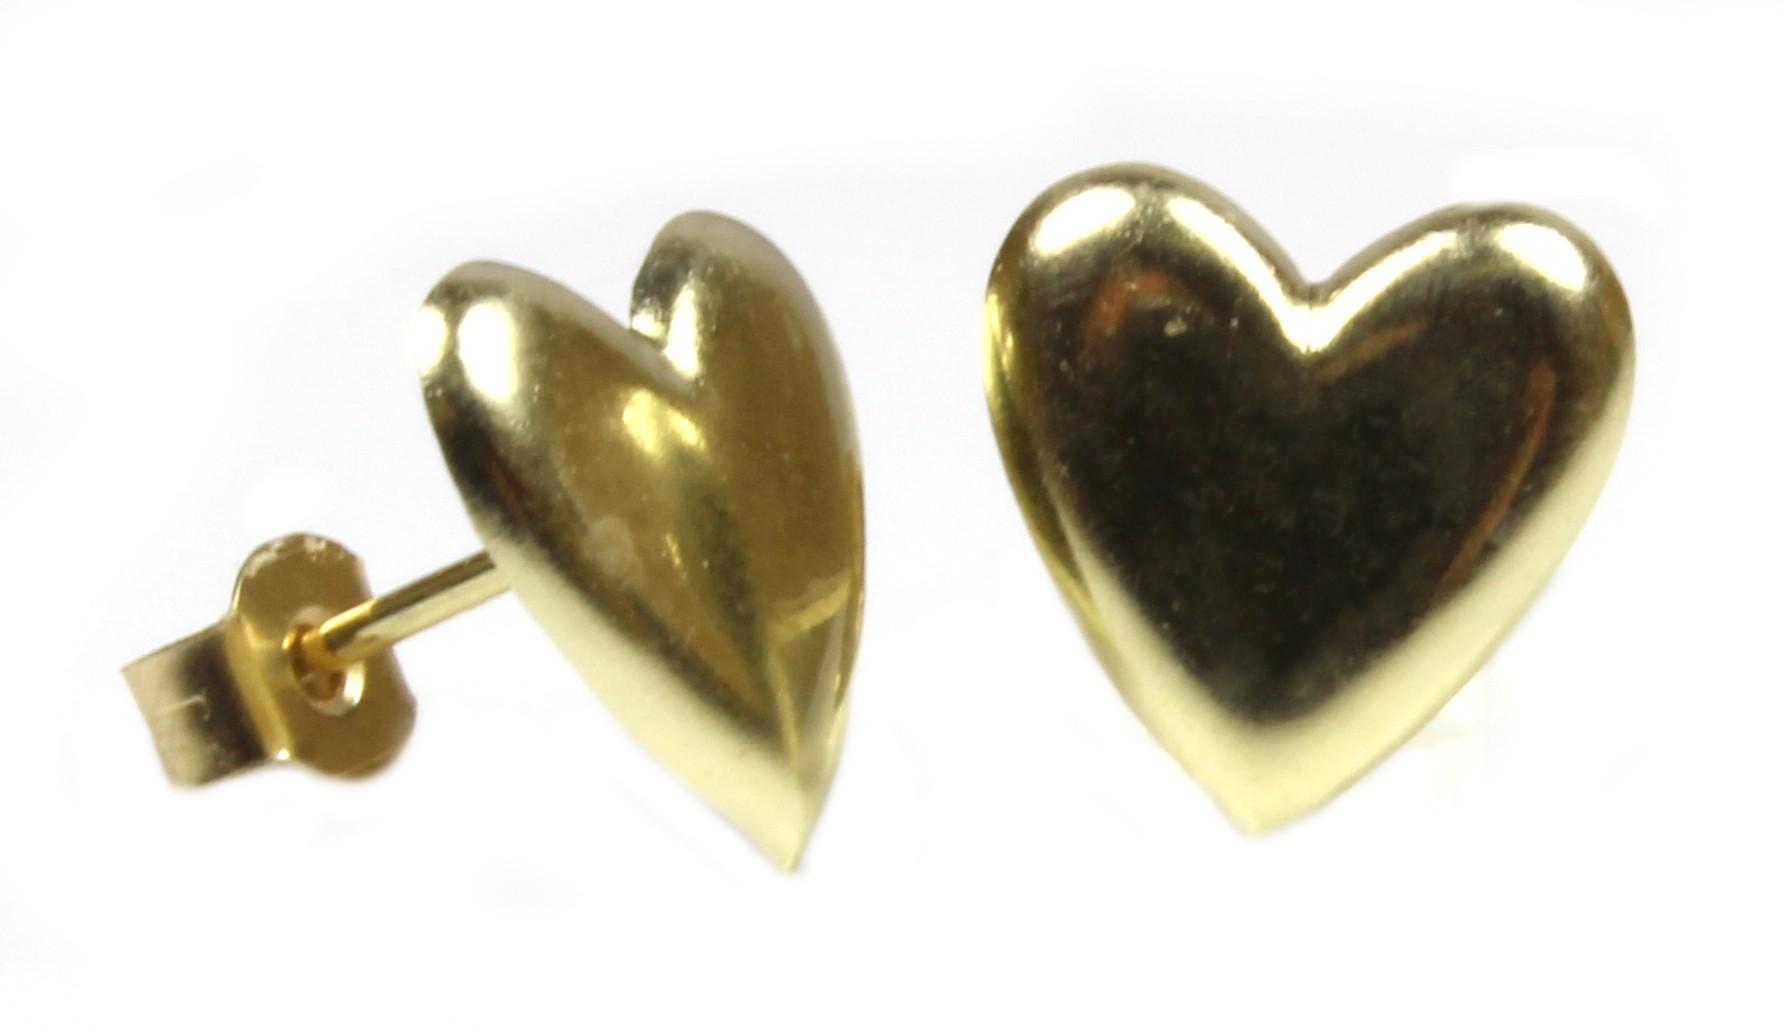 Gold heart stud earring 7mm 375 9ct gold ebay - 375 gold ...